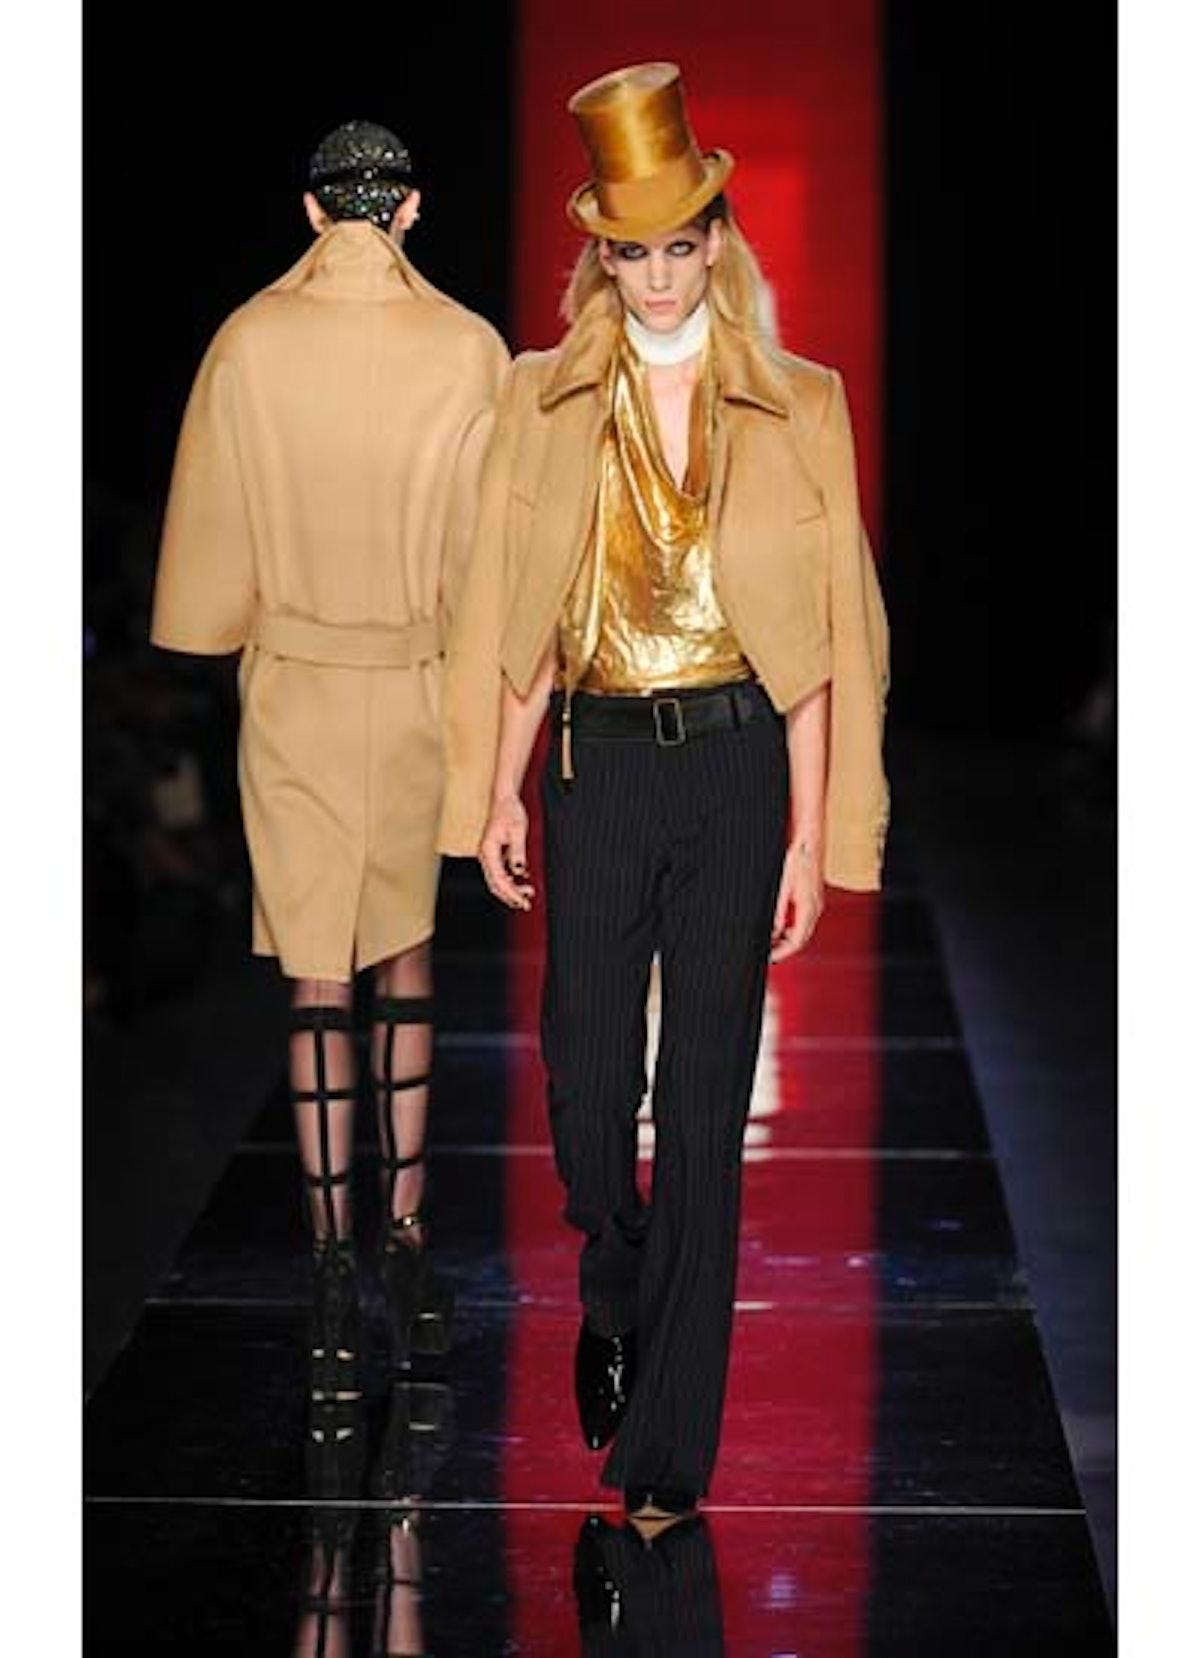 fass-jean-paul-gaultier-couture-2012-runway-20-v.jpg